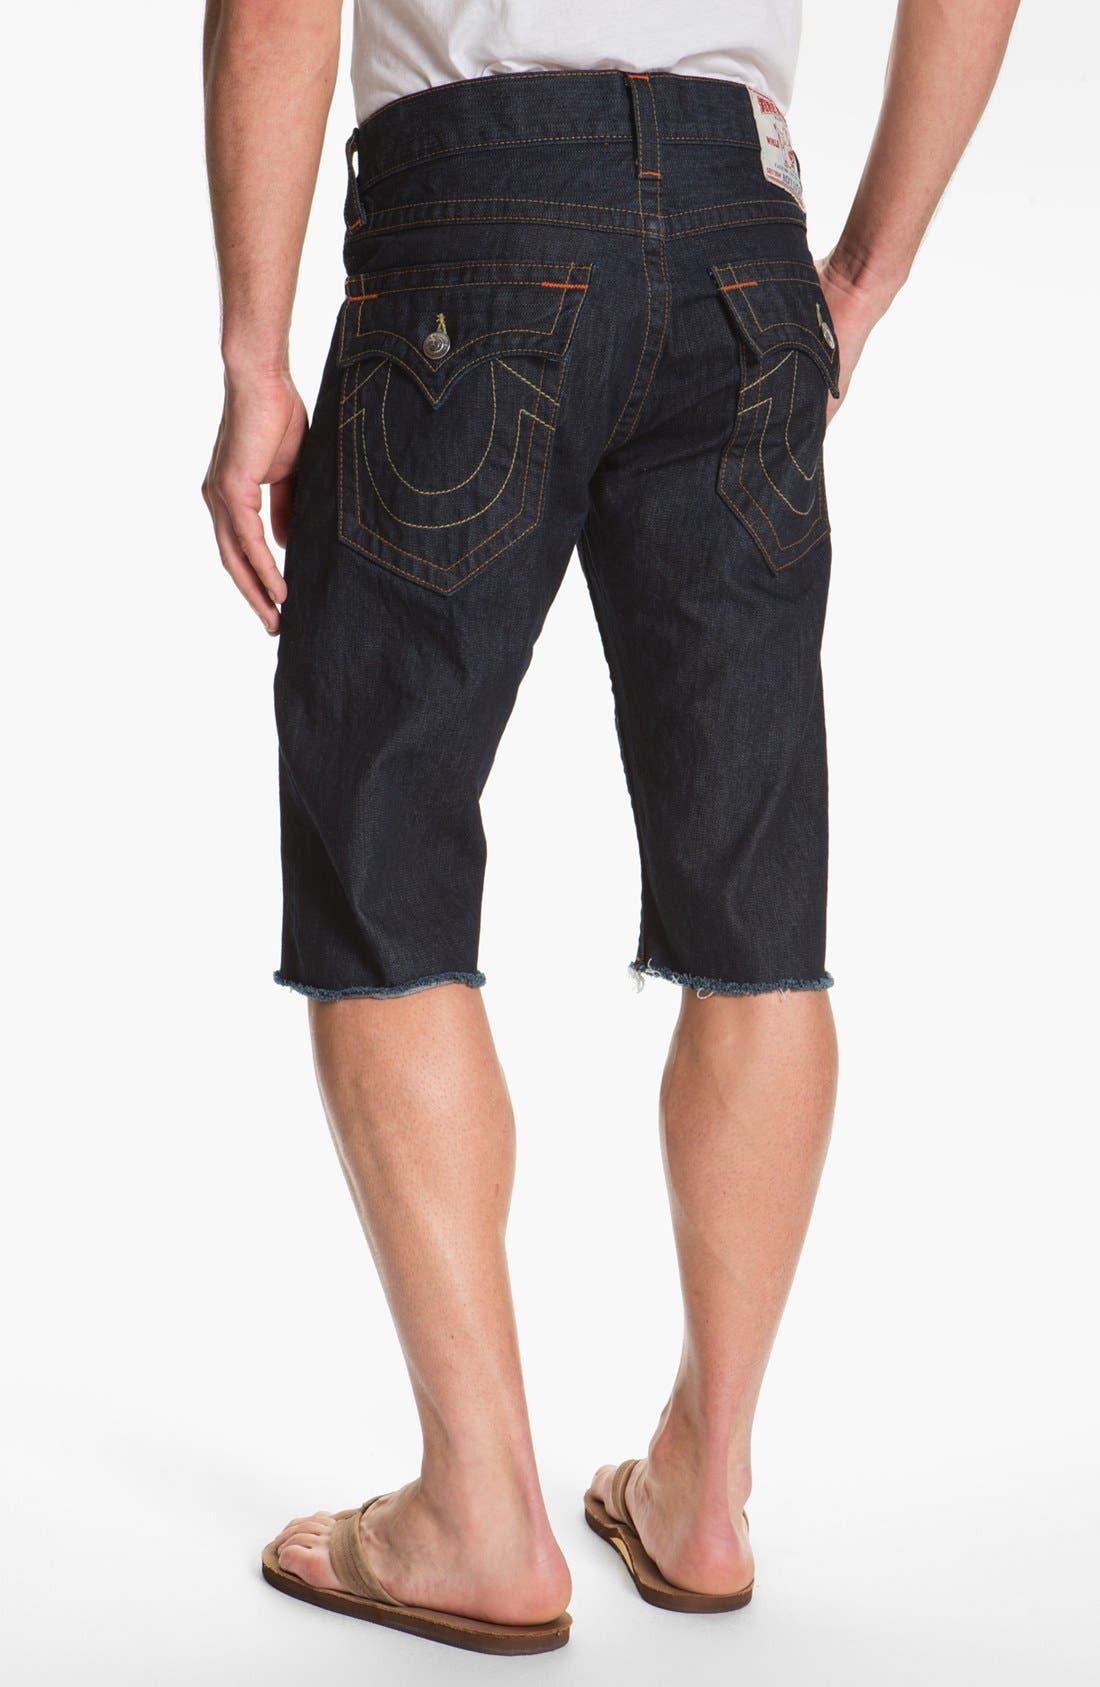 Alternate Image 1 Selected - True Religion Brand Jeans 'Ricky' Cut Off Denim Shorts